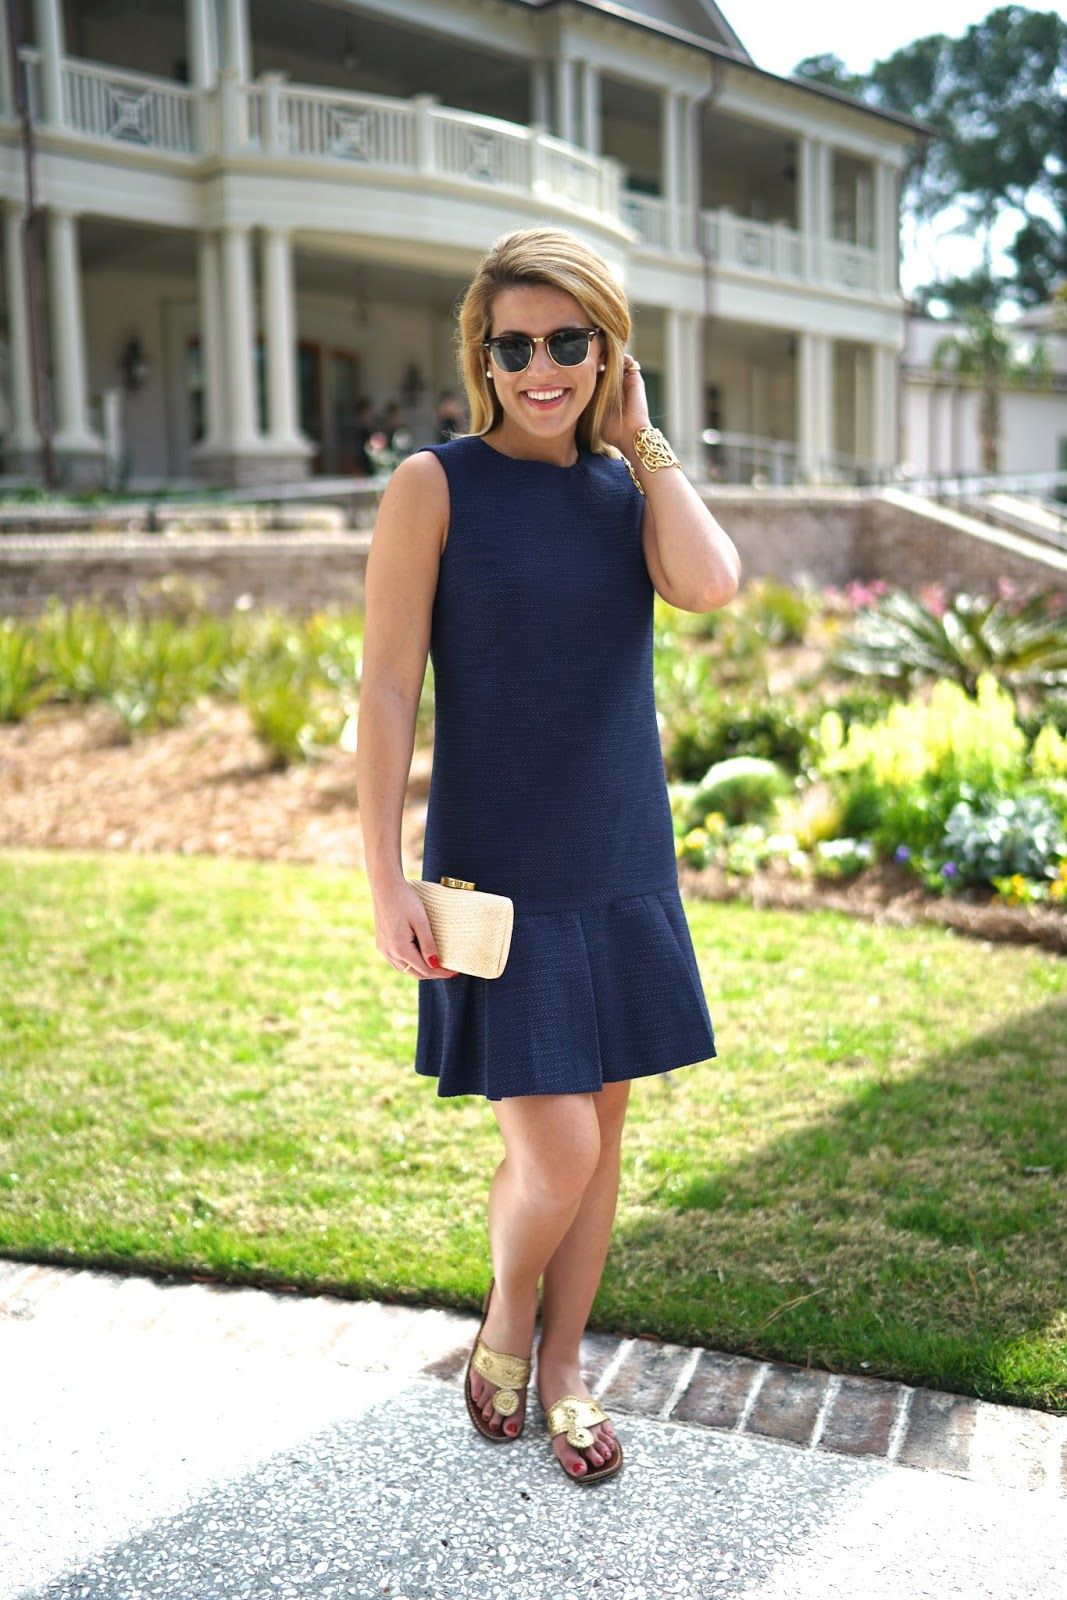 f2df72a8de1 Summer Wind  Little Blue Dress + Straw Clutch on Hilton Head Island ...